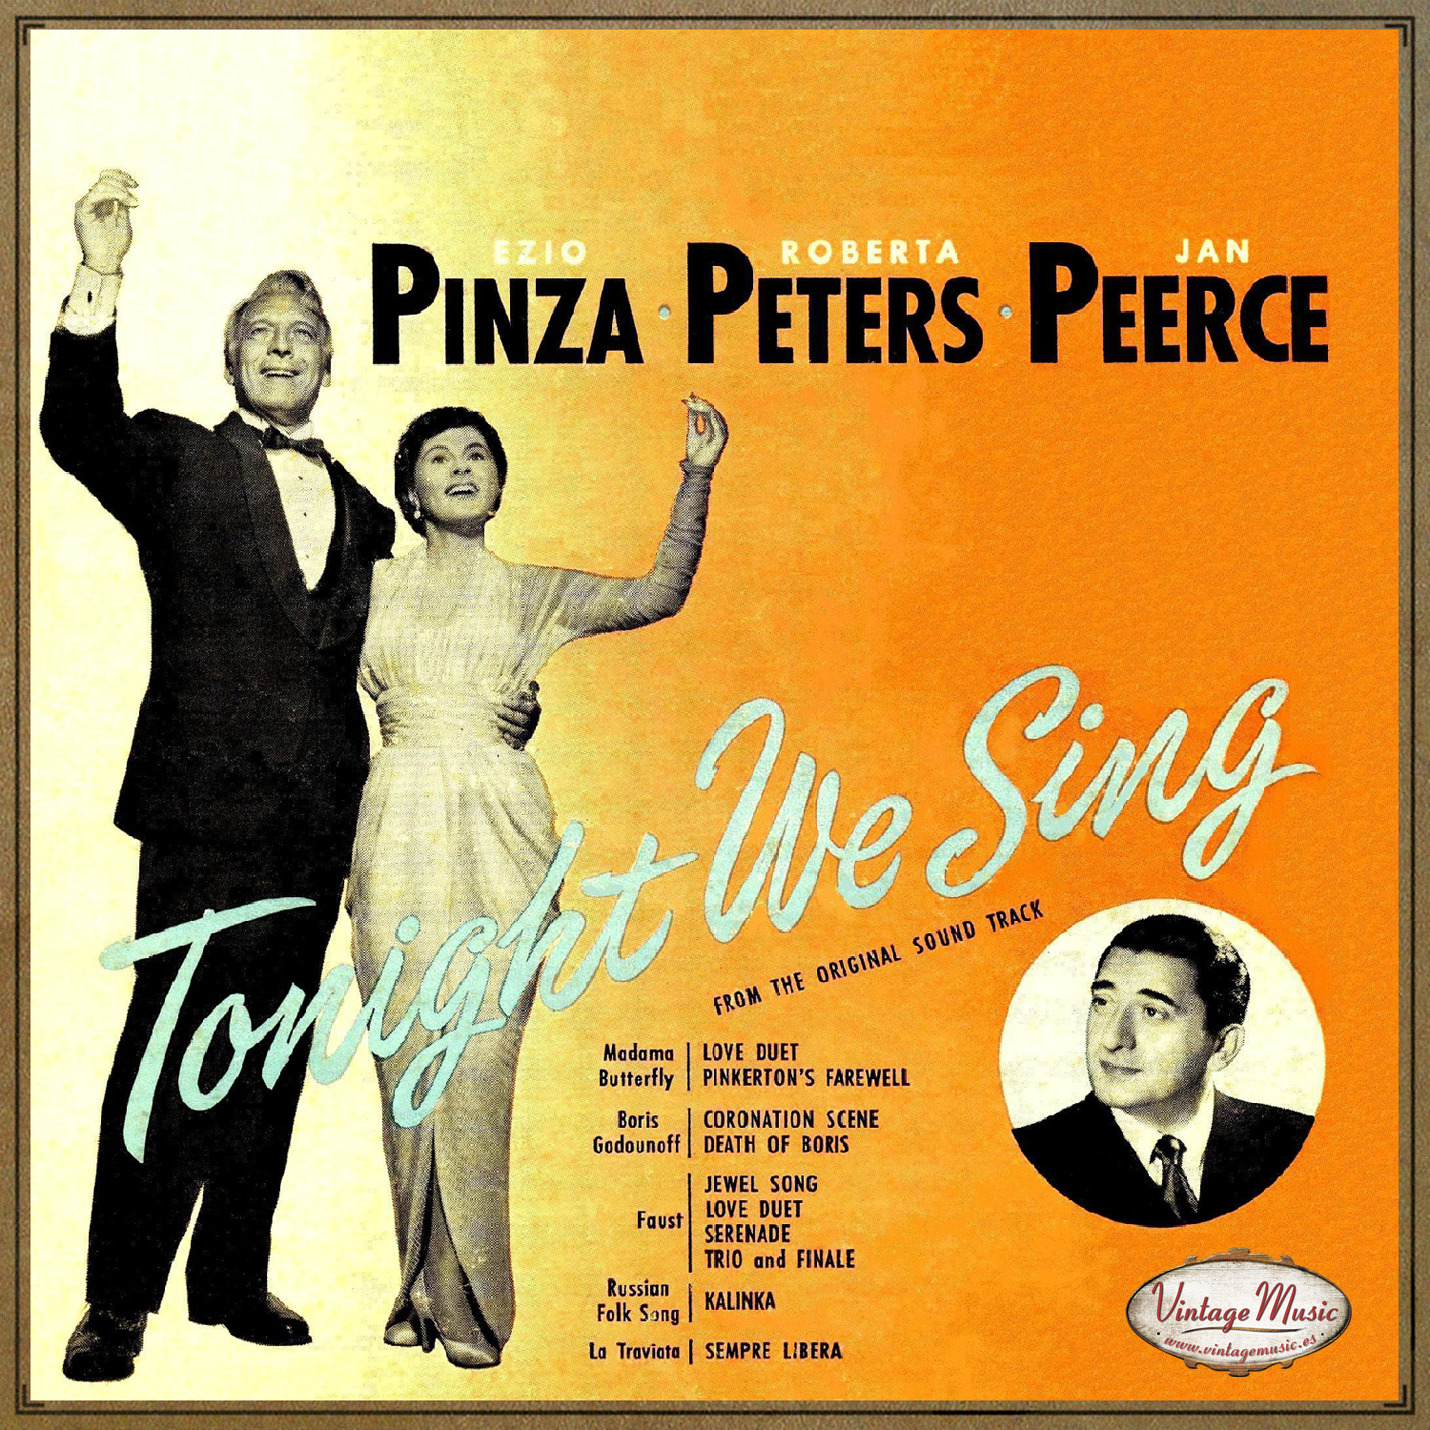 TONIGHT WE SING CD Vintage / Ezio Pinza - Roberta Peters -...